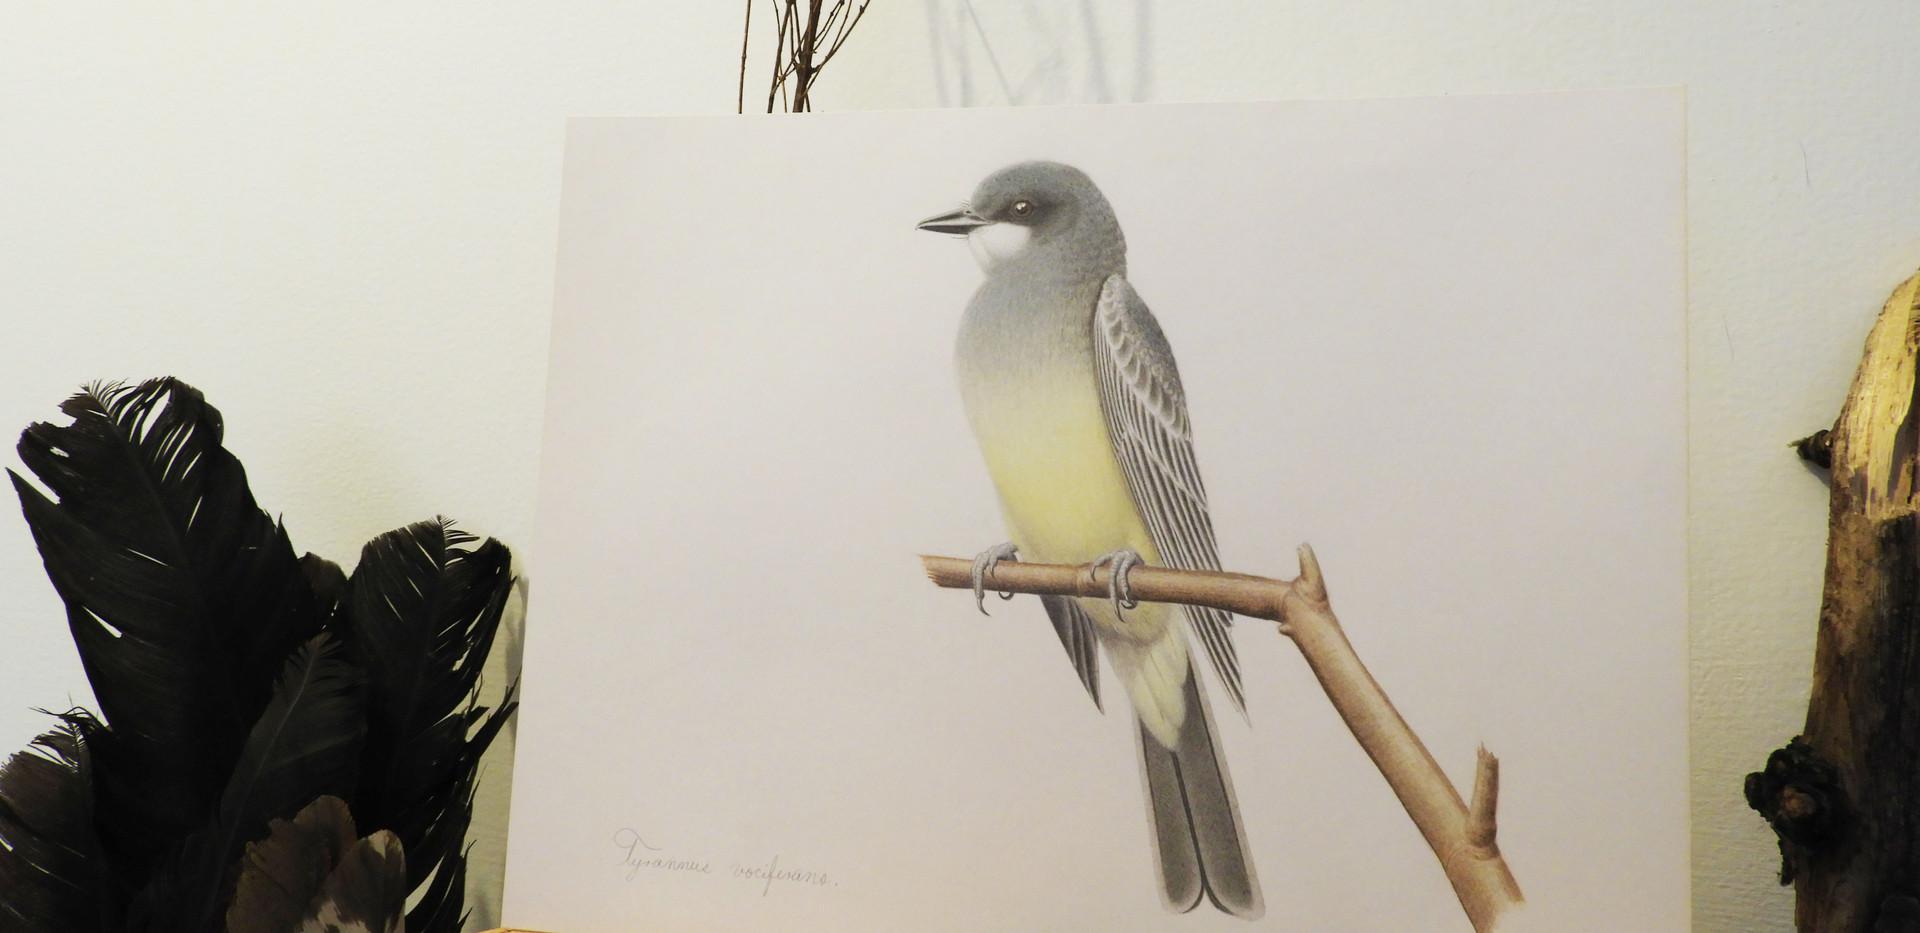 Tirano Chibiú | Cassin's Kingbird